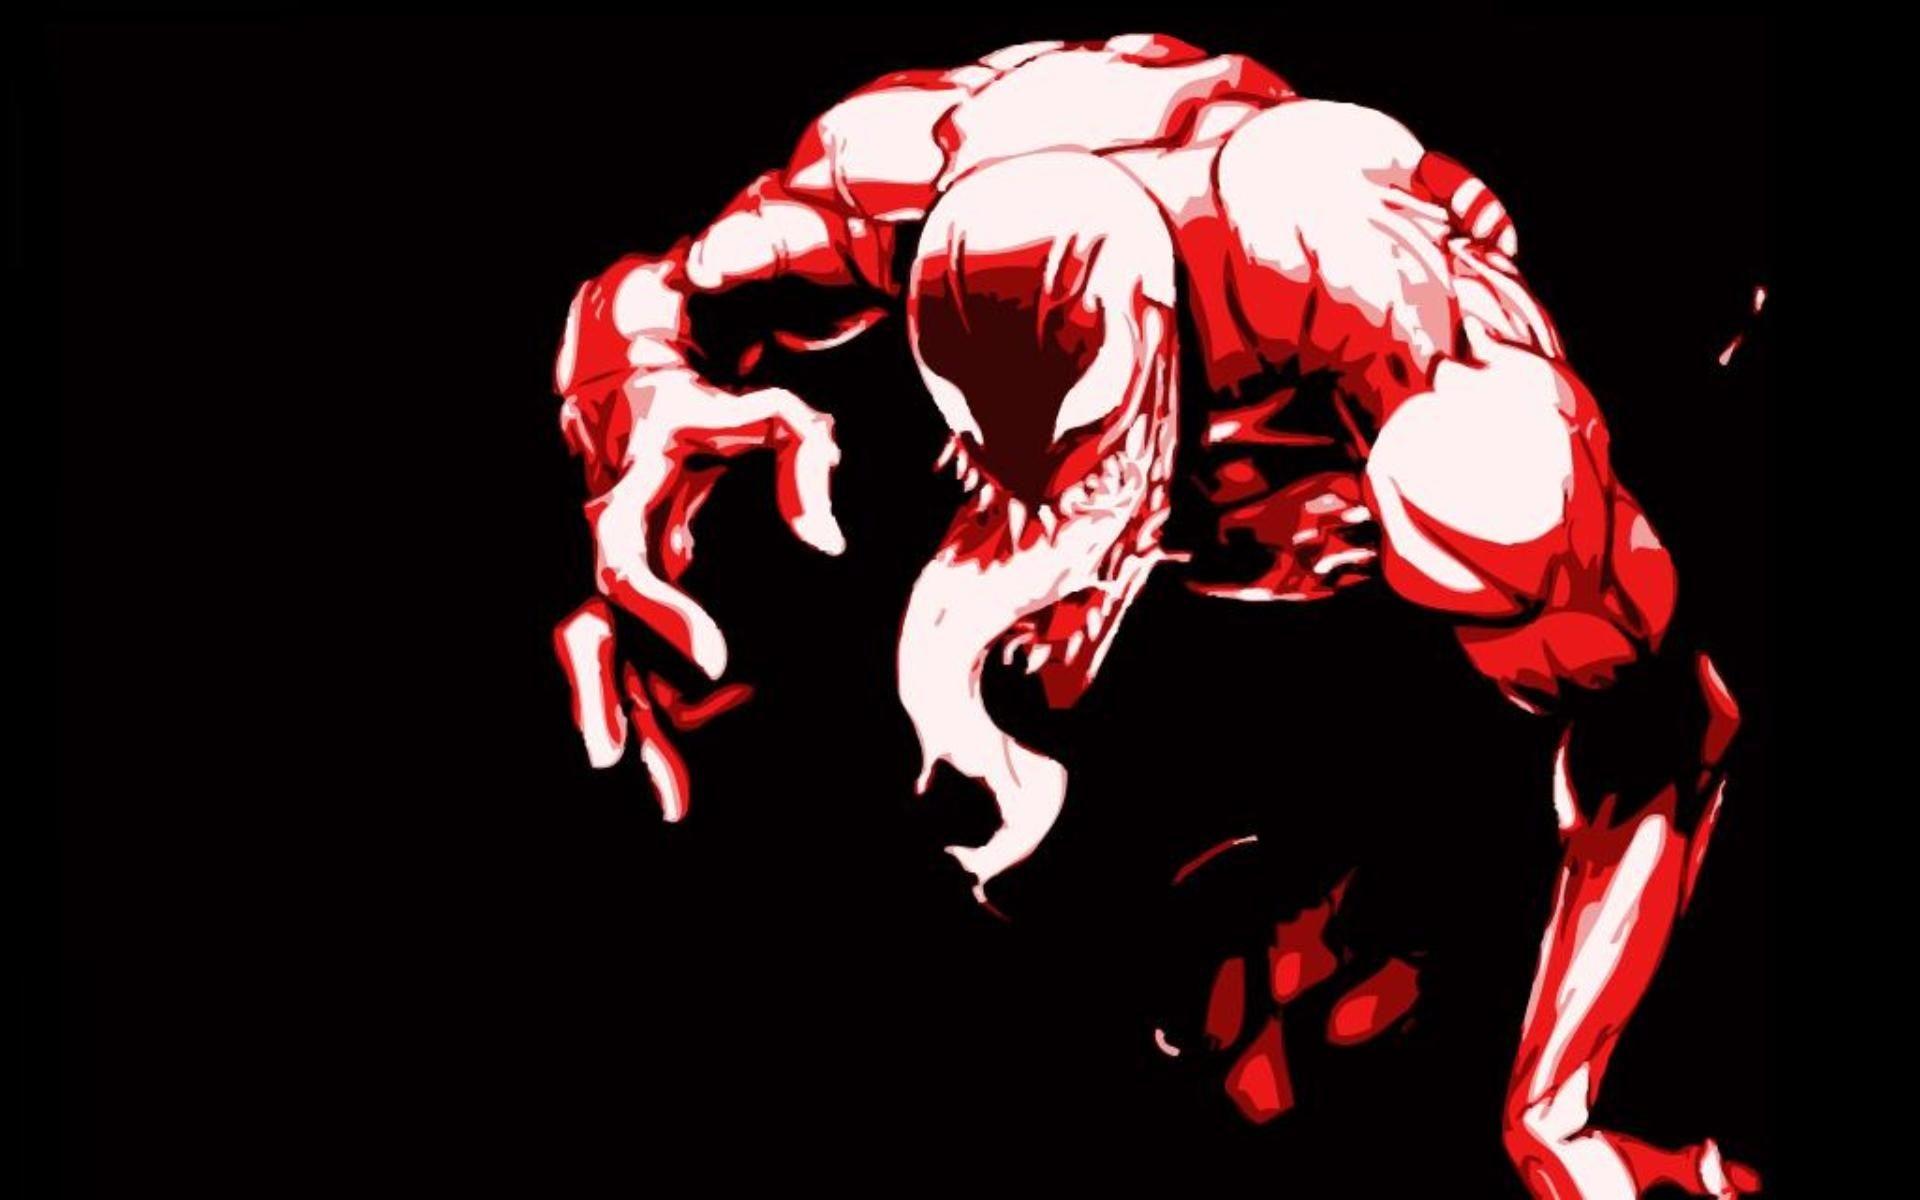 Carnage comics | movies-marvel-comics-carnage-wallpaper-for-desktop